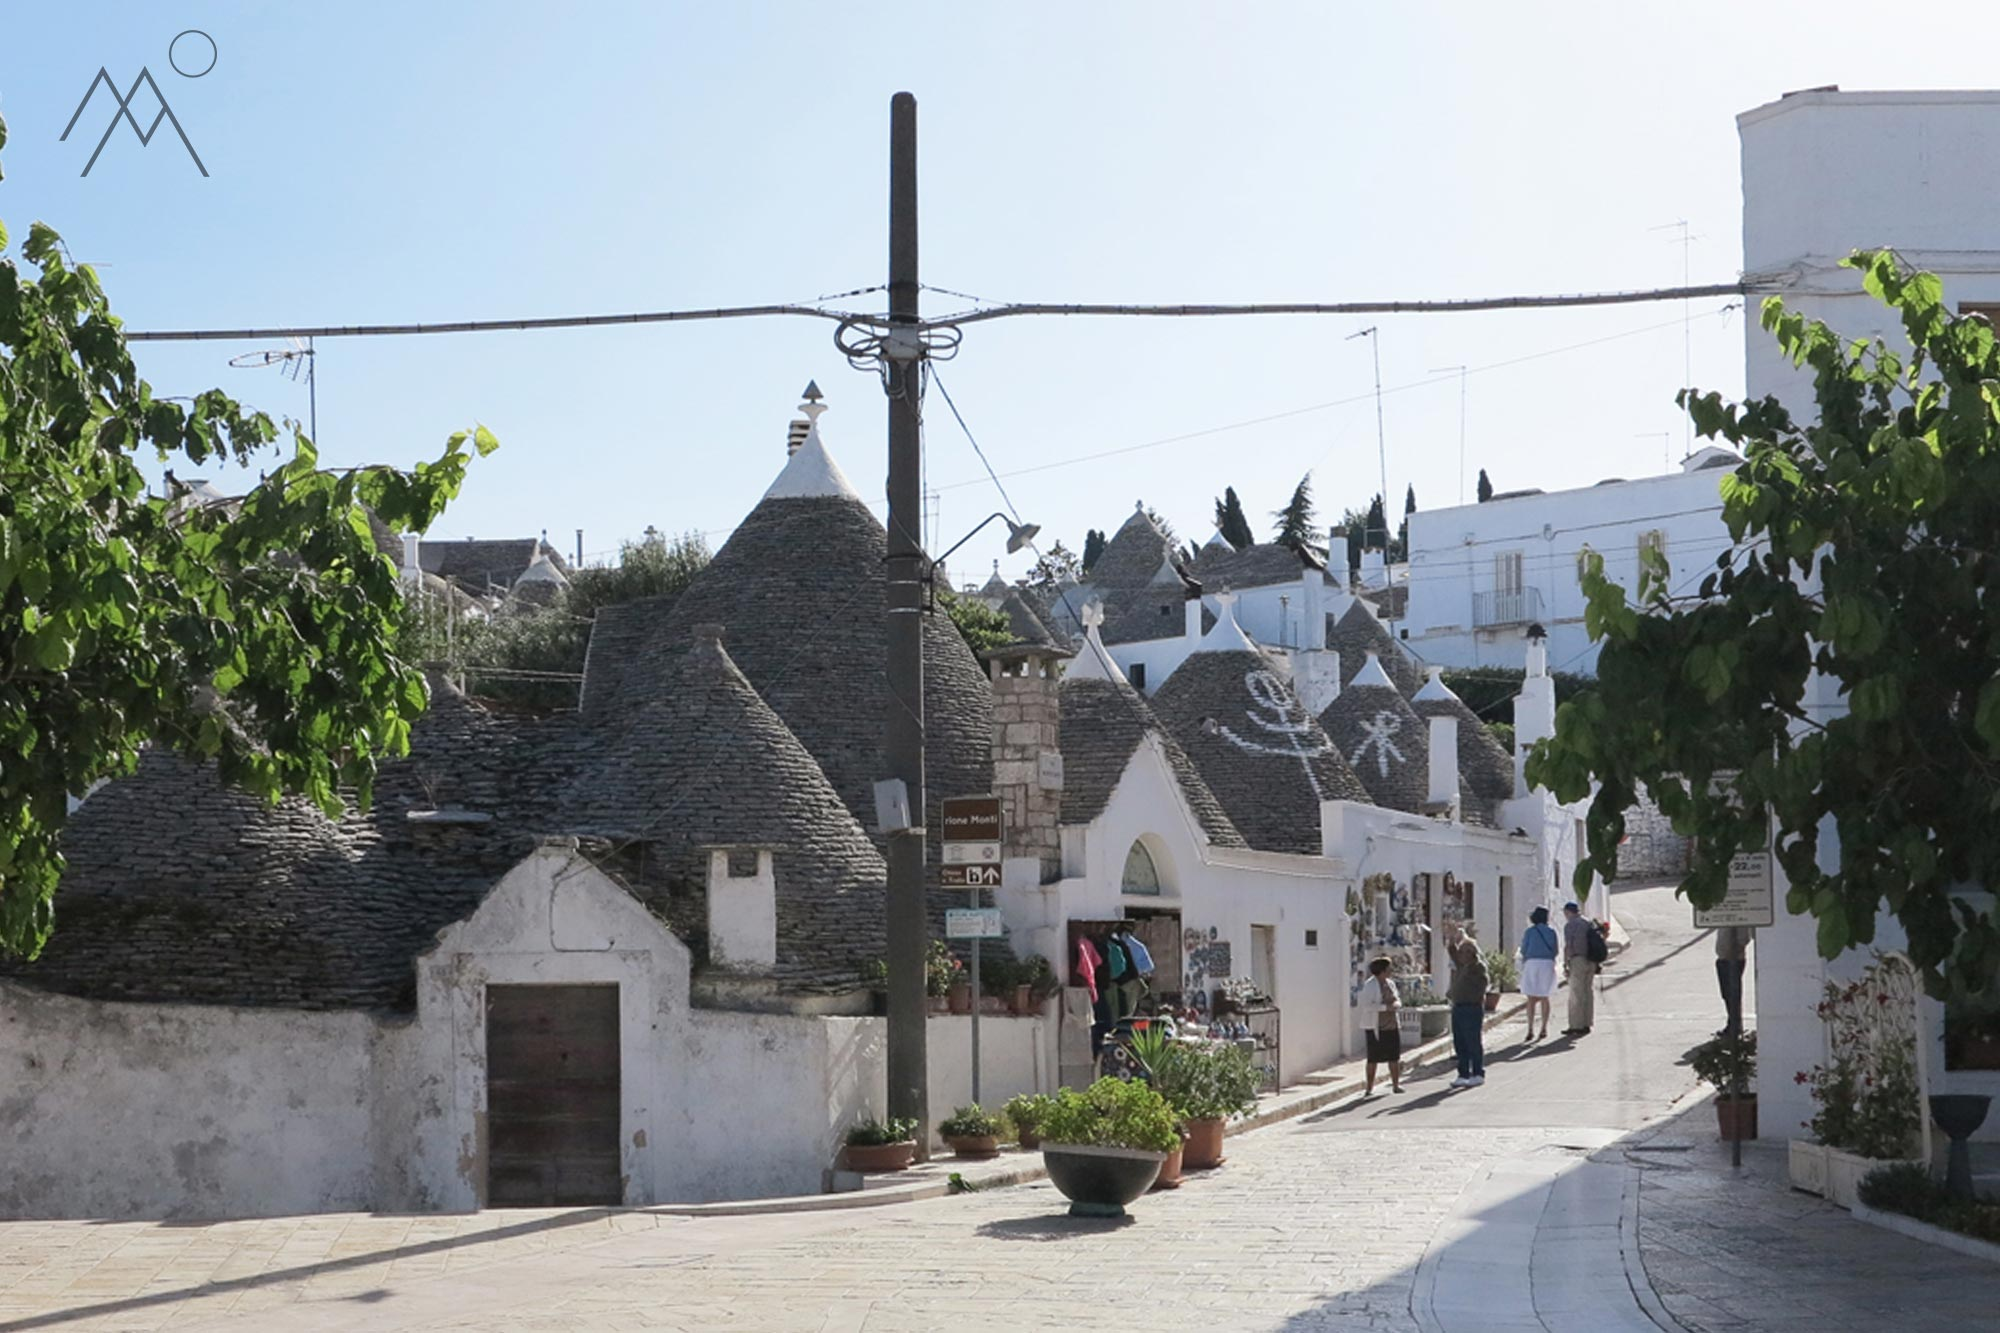 Tiny little streets of Alberobello's historic center, Italy